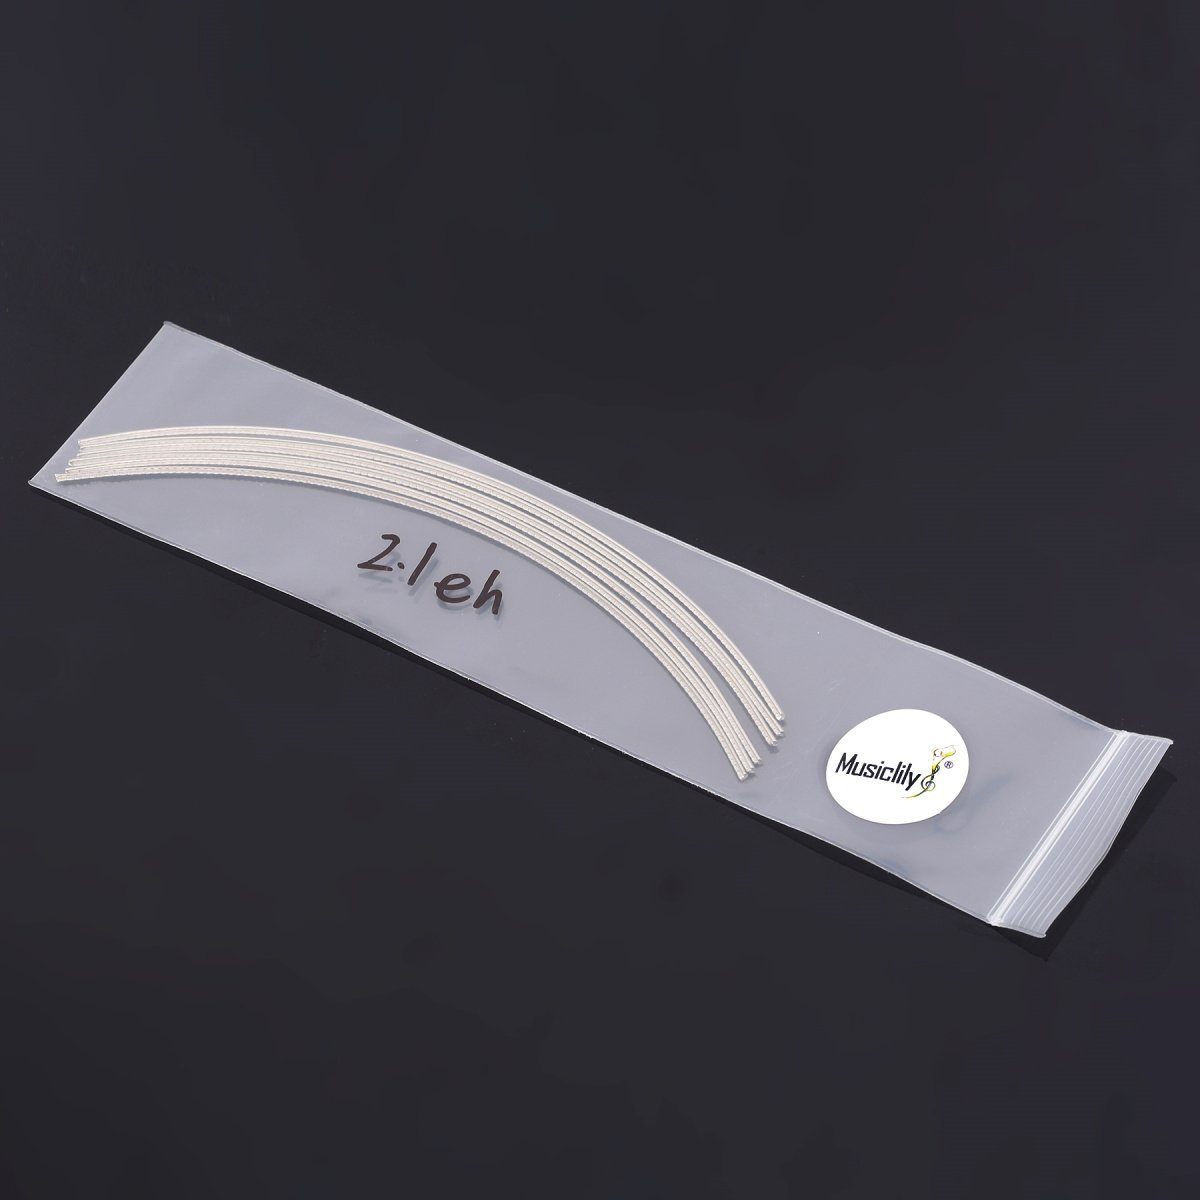 Sintoms Fret Wire Set for Ibanez ESP Jackson Hard Rock Metal Rock Guitar 3.0mm Jumbo Size Nickel Silver Extra Hard